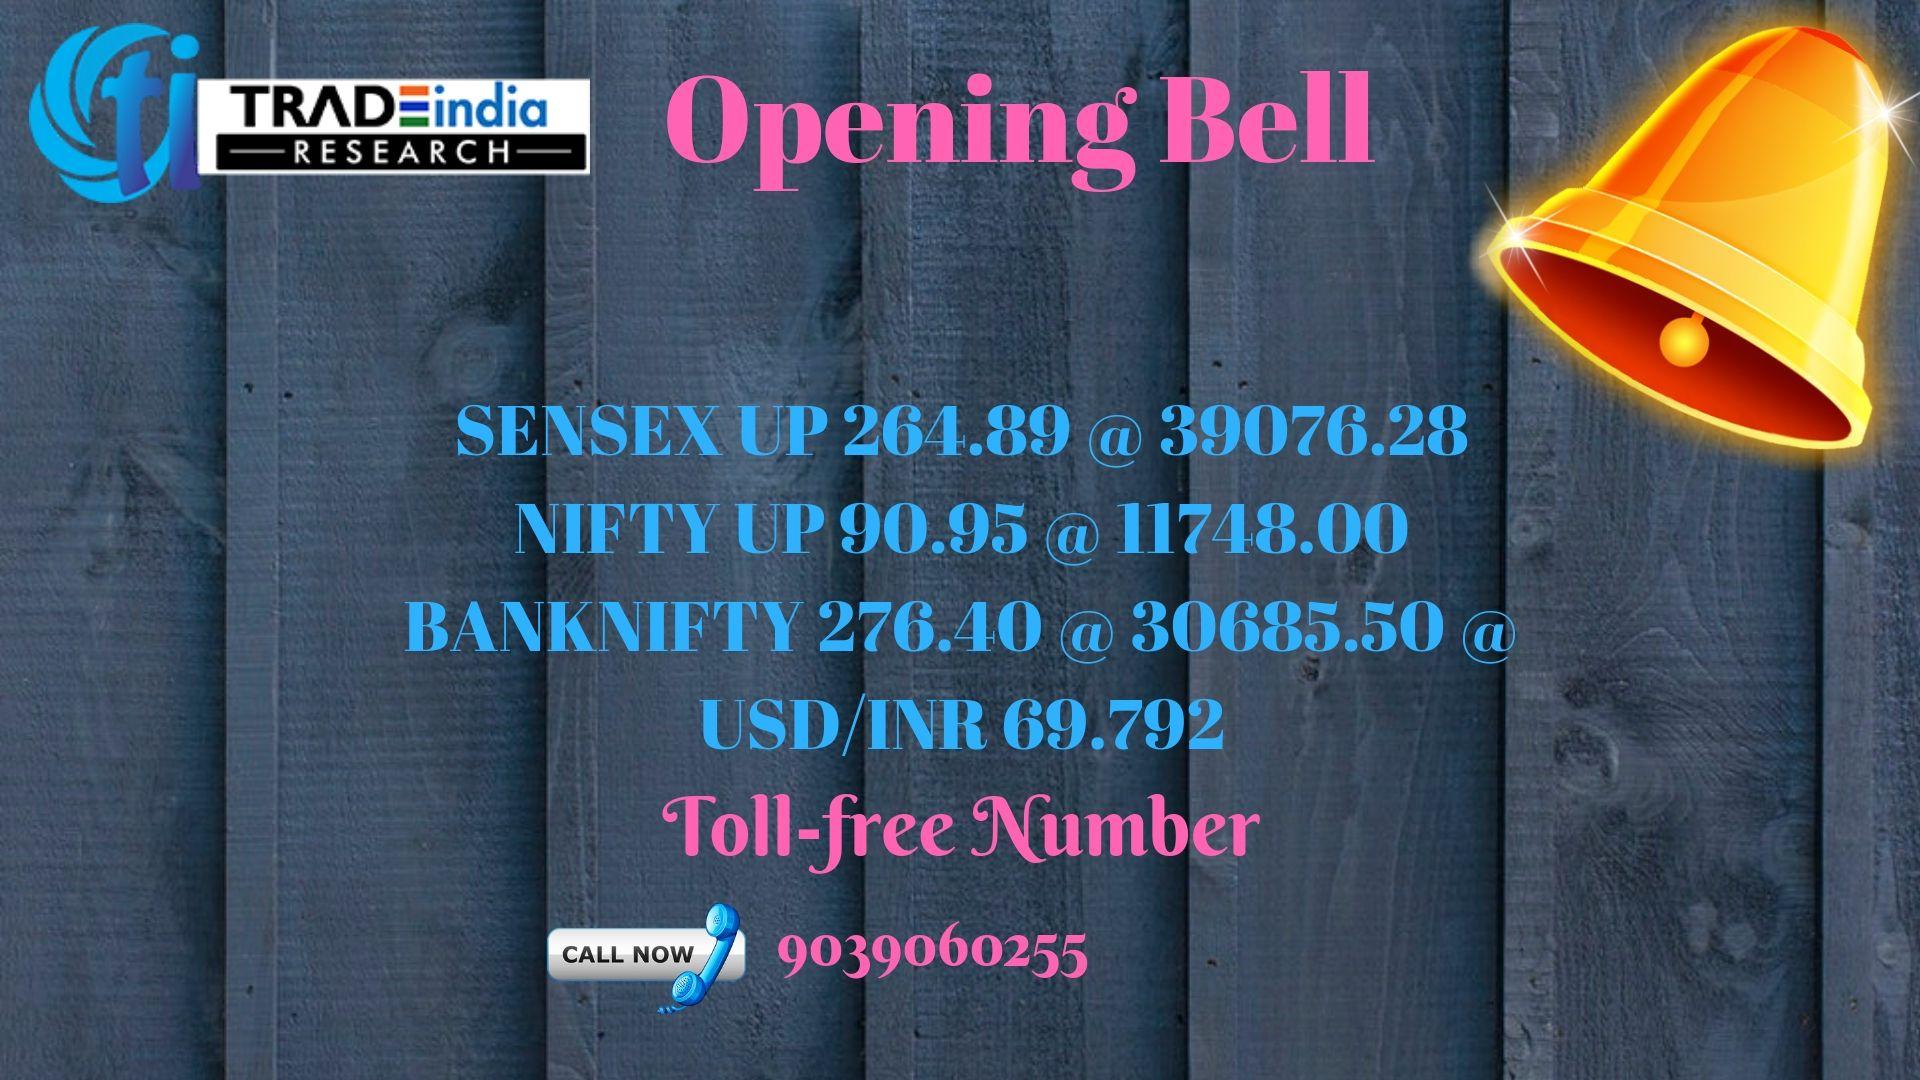 Opening Bell Share Market Stock Market Marketing